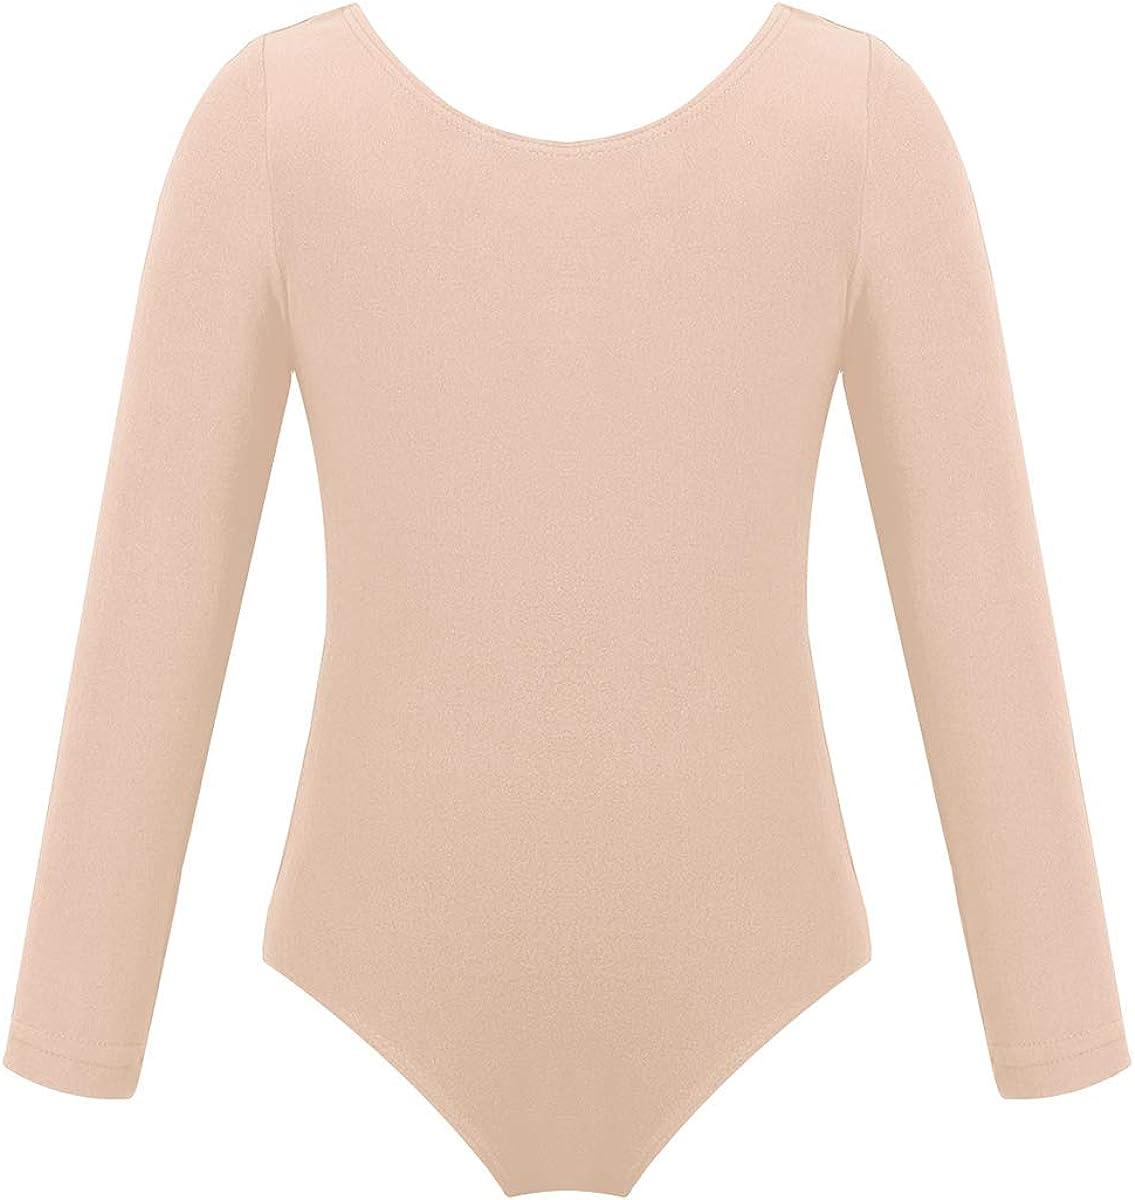 YONGHS Kids Great interest Girls One Piece Ballet Dancer Elegant Dance Classic Leotard